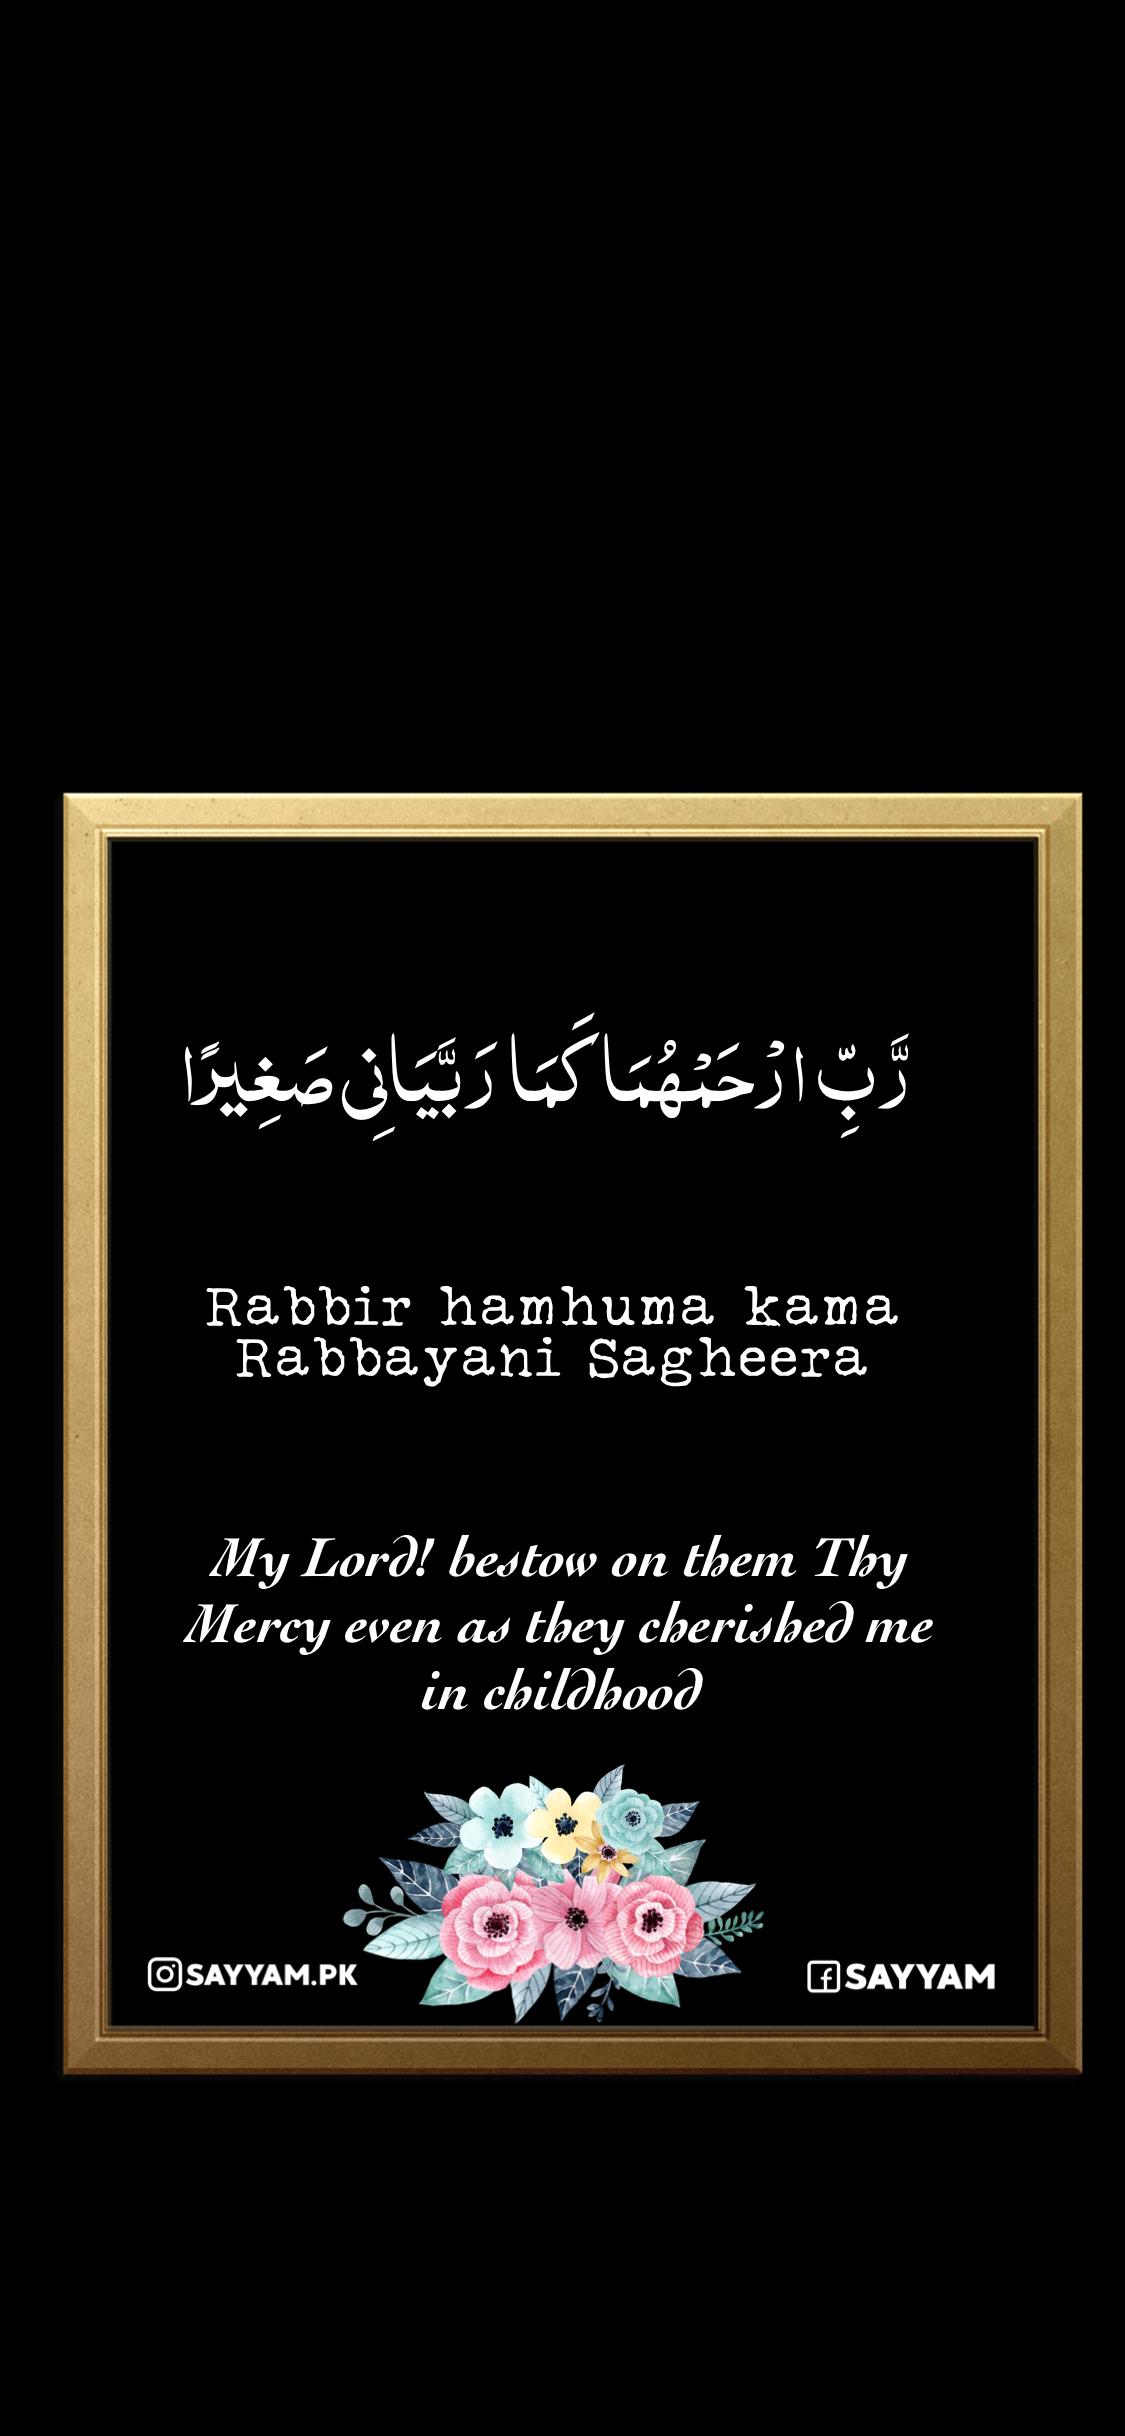 Dua For Parents Islamic Wallpaper Iphone Wallpaper Wallpaper